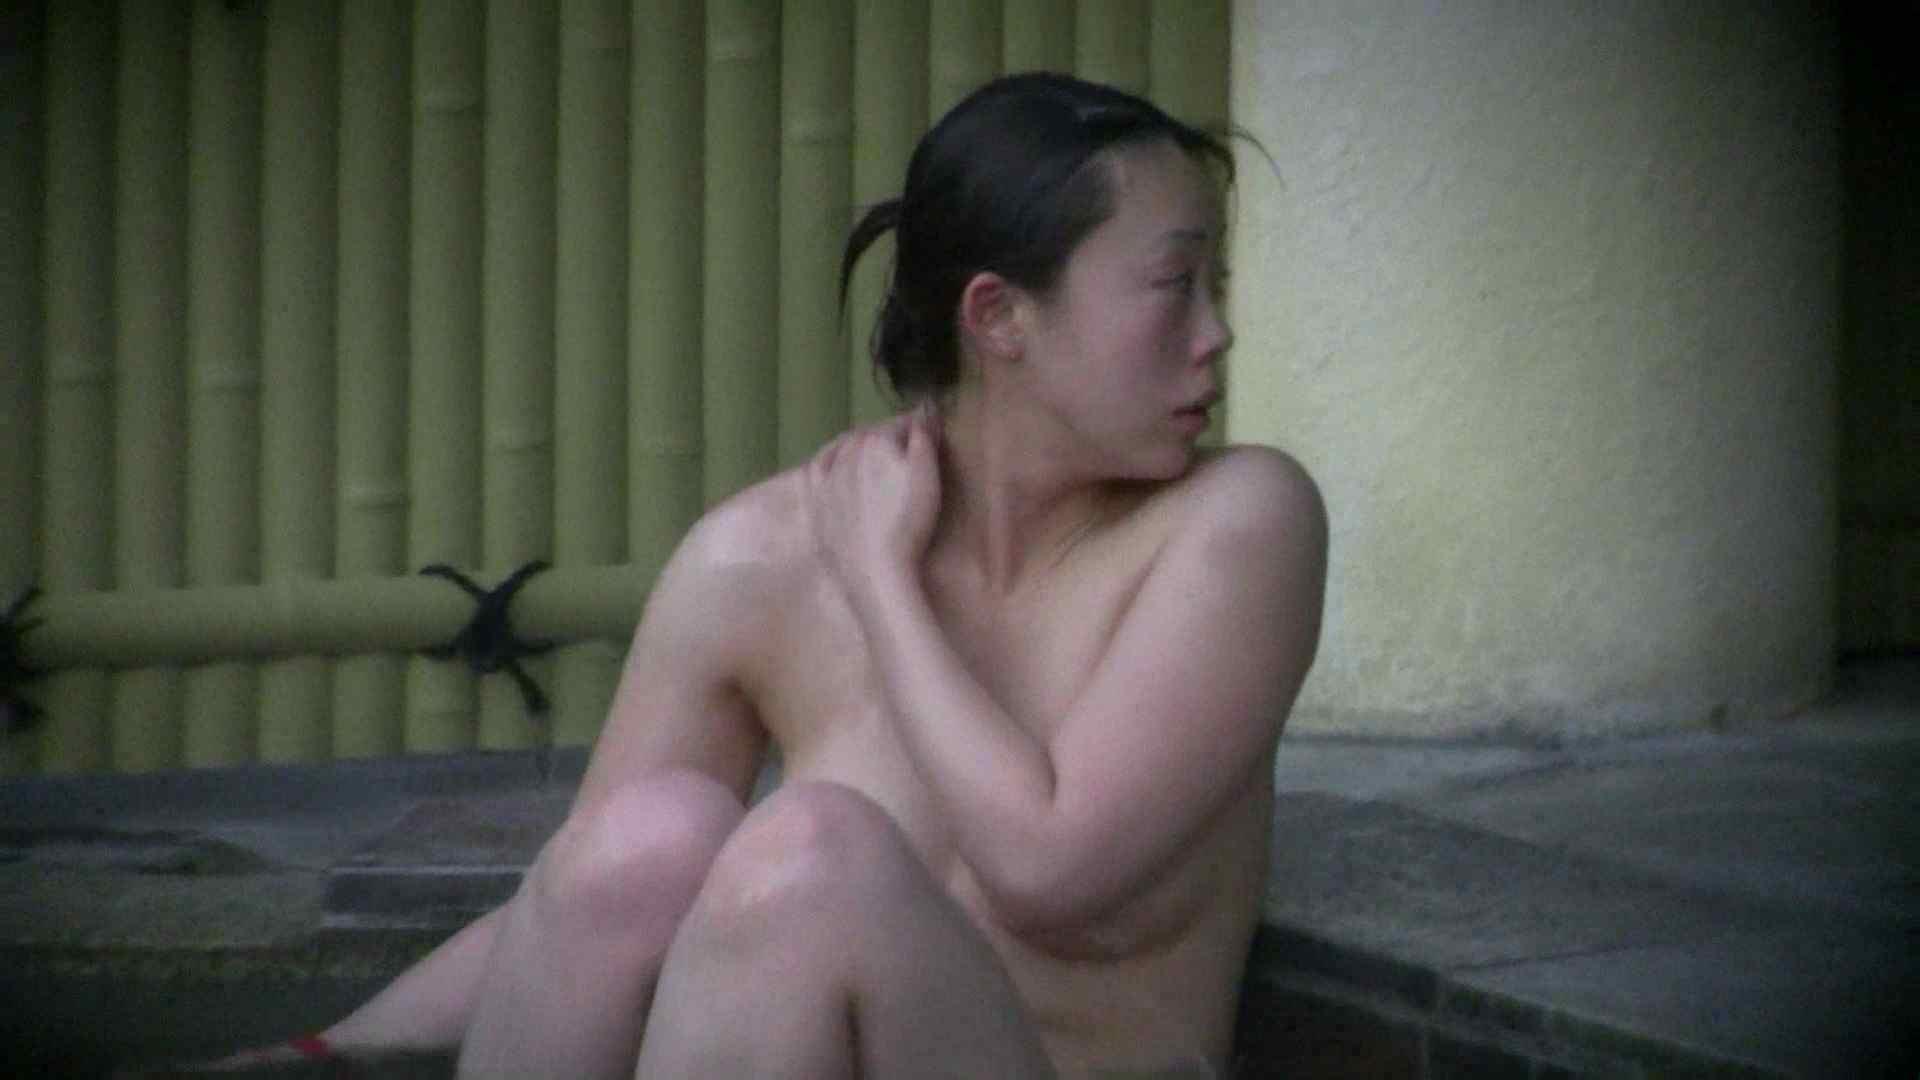 Aquaな露天風呂Vol.540 露天風呂編 | 盗撮シリーズ  94PIX 65